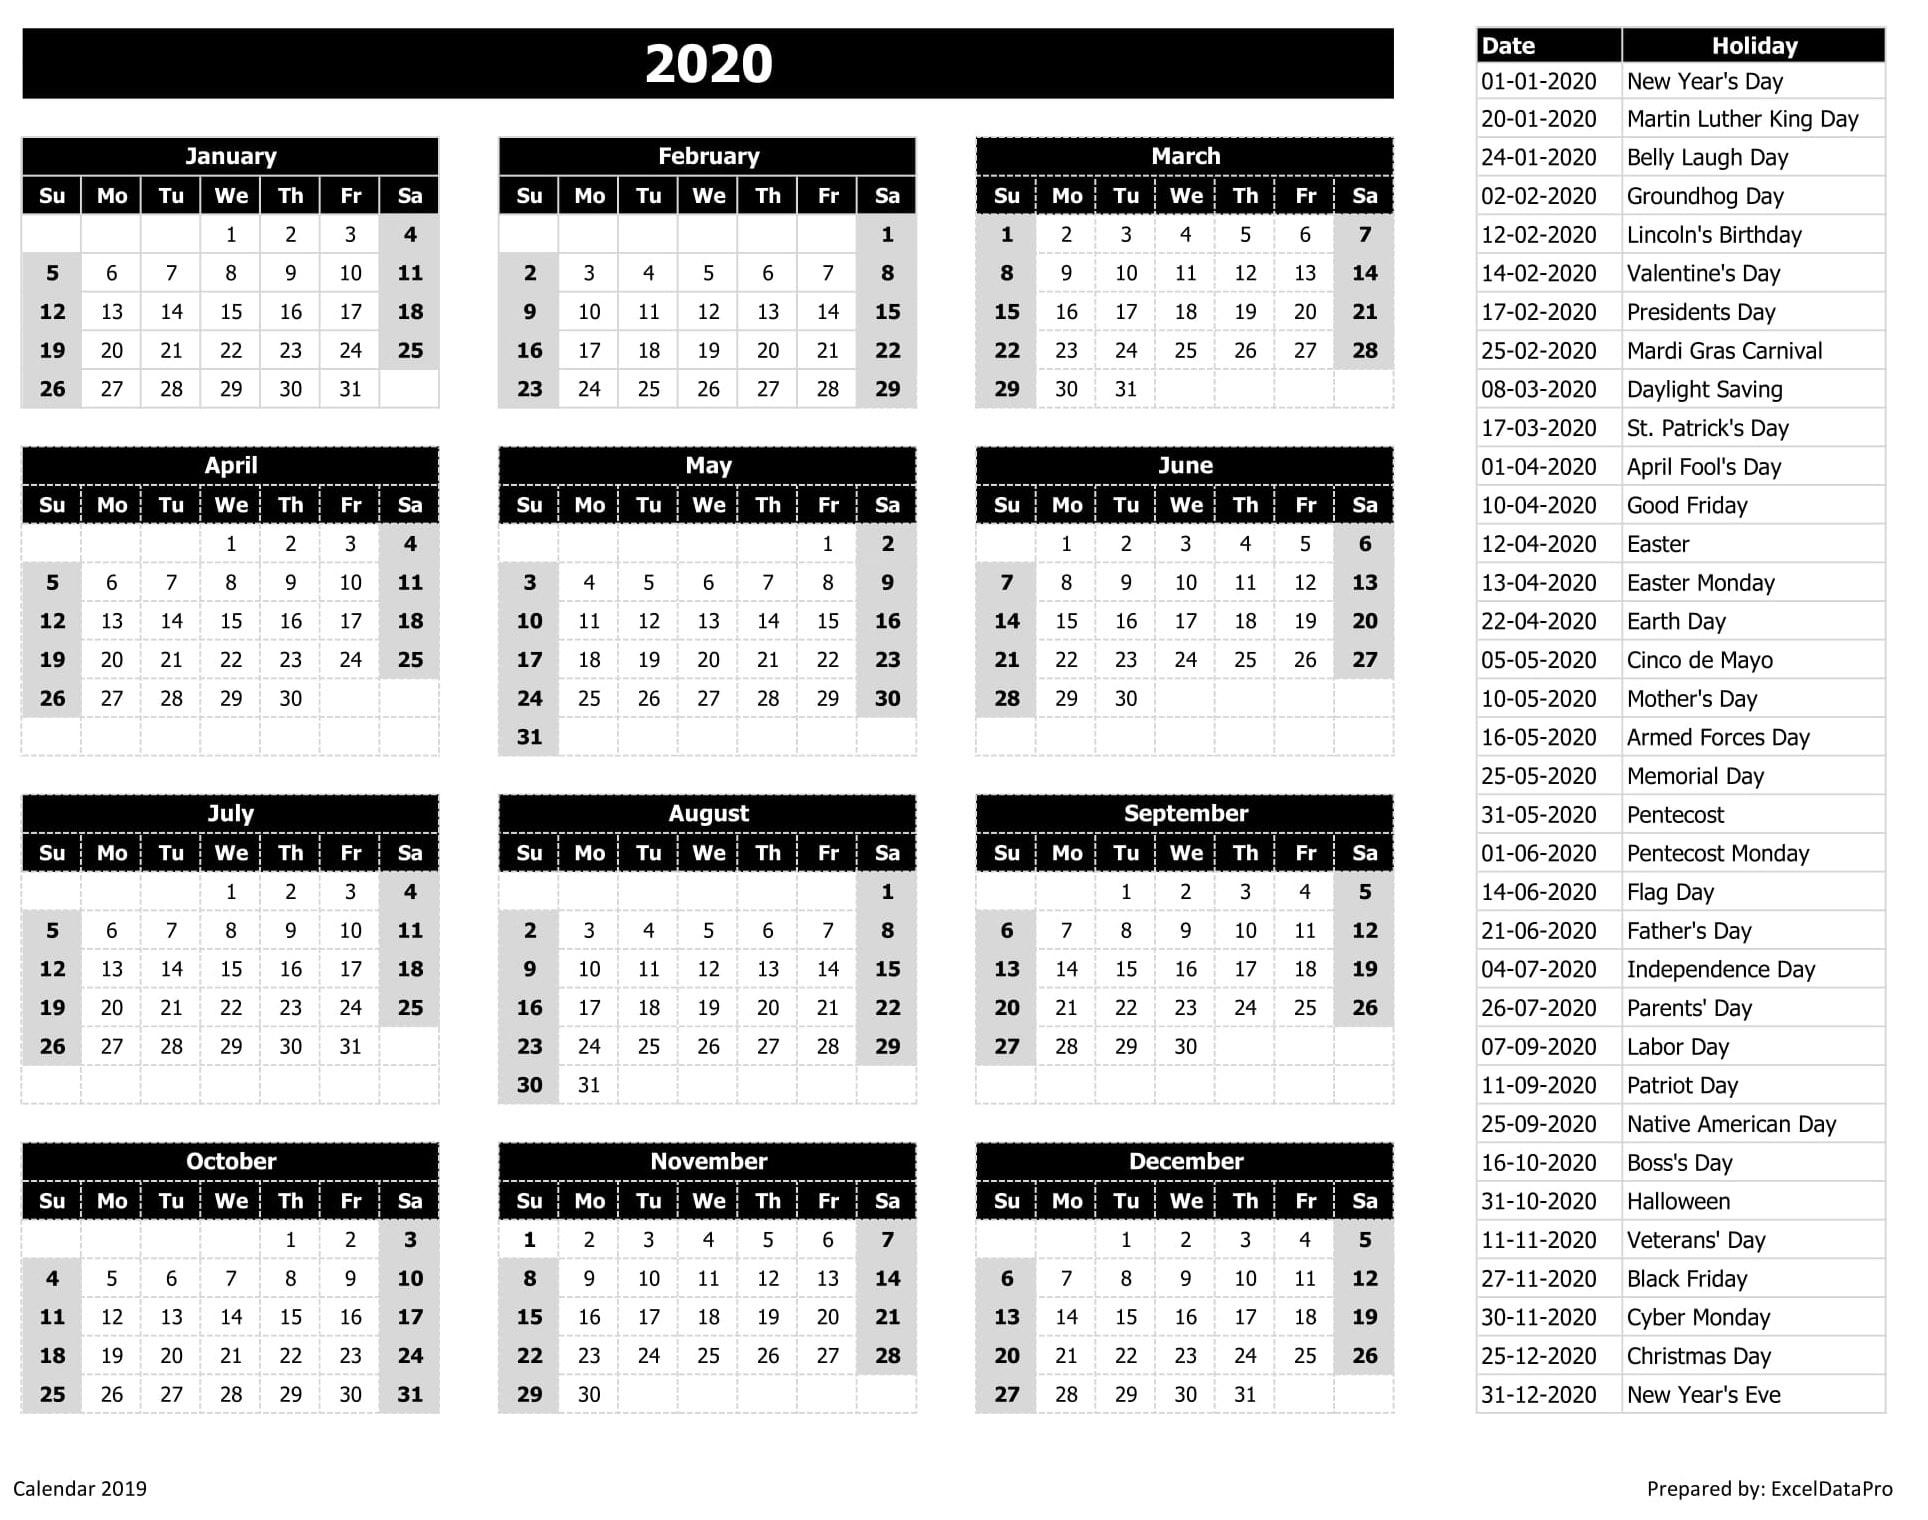 2020 Calendar Excel Templates, Printable Pdfs & Images 2020 Calendar India Pdf